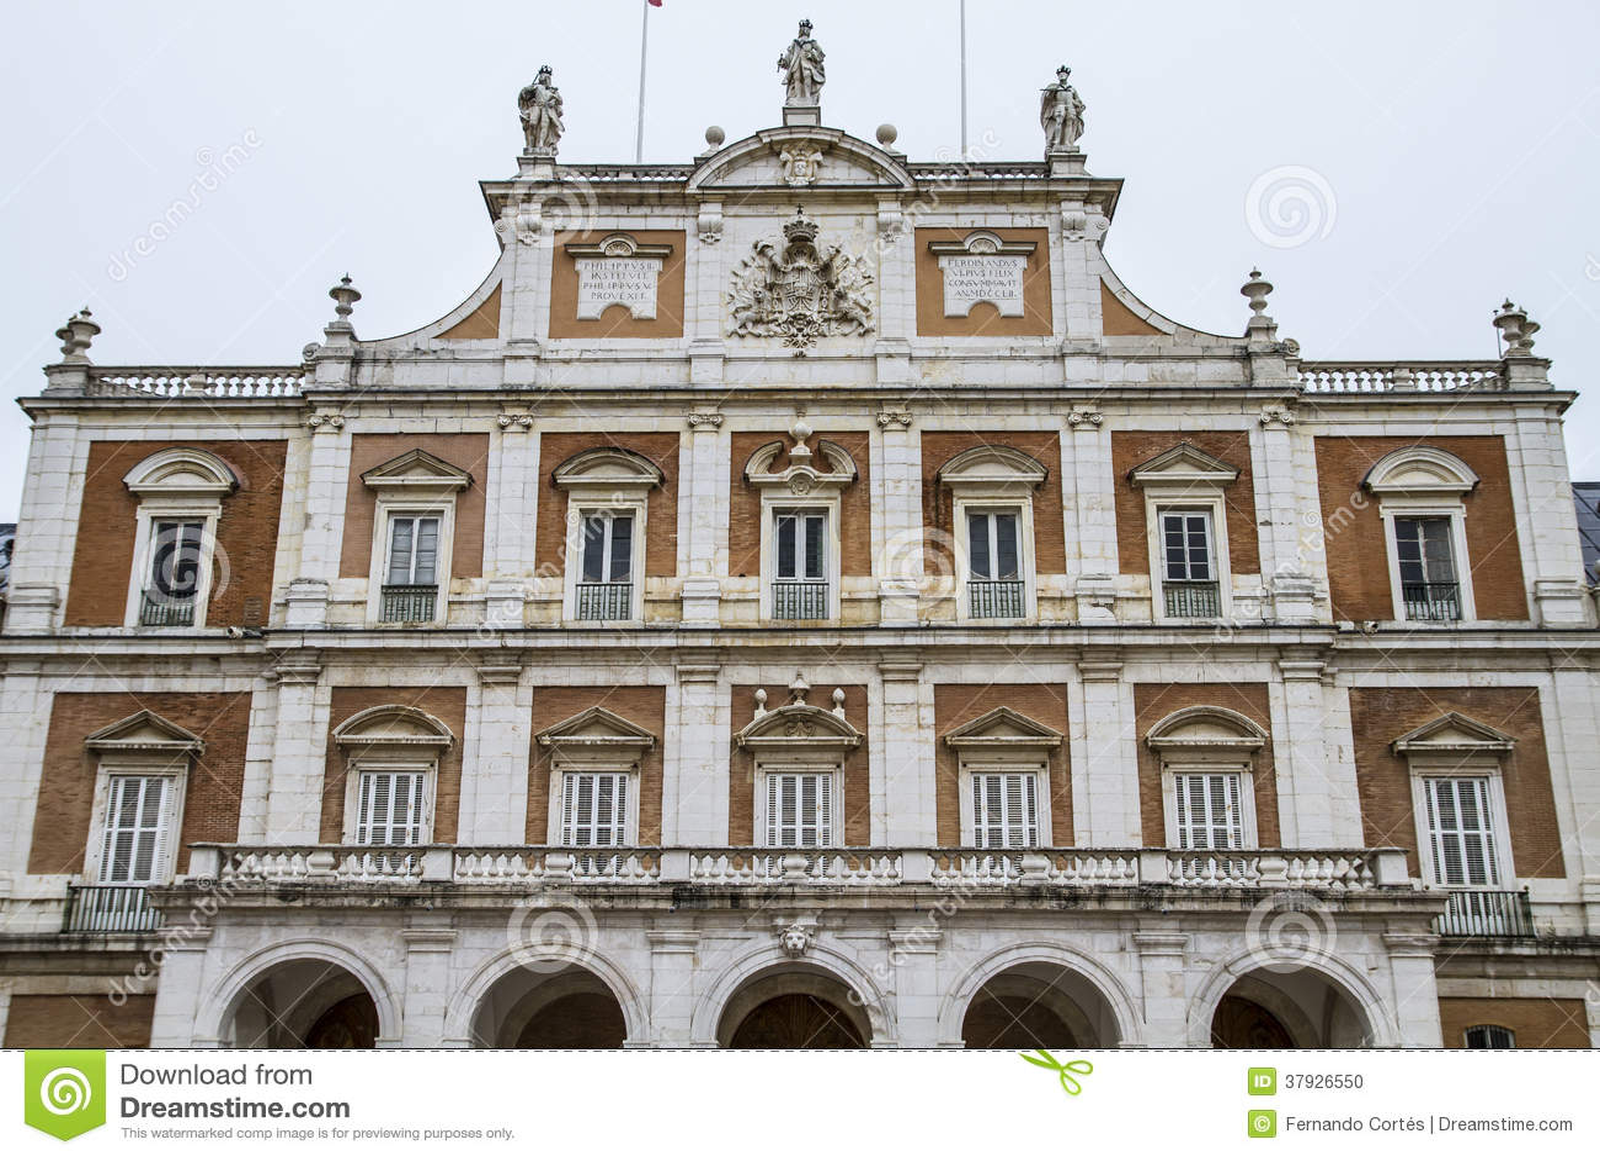 Главный фасад. Дворец Аранхуэса, Мадрида, наследия Spain.World сидит